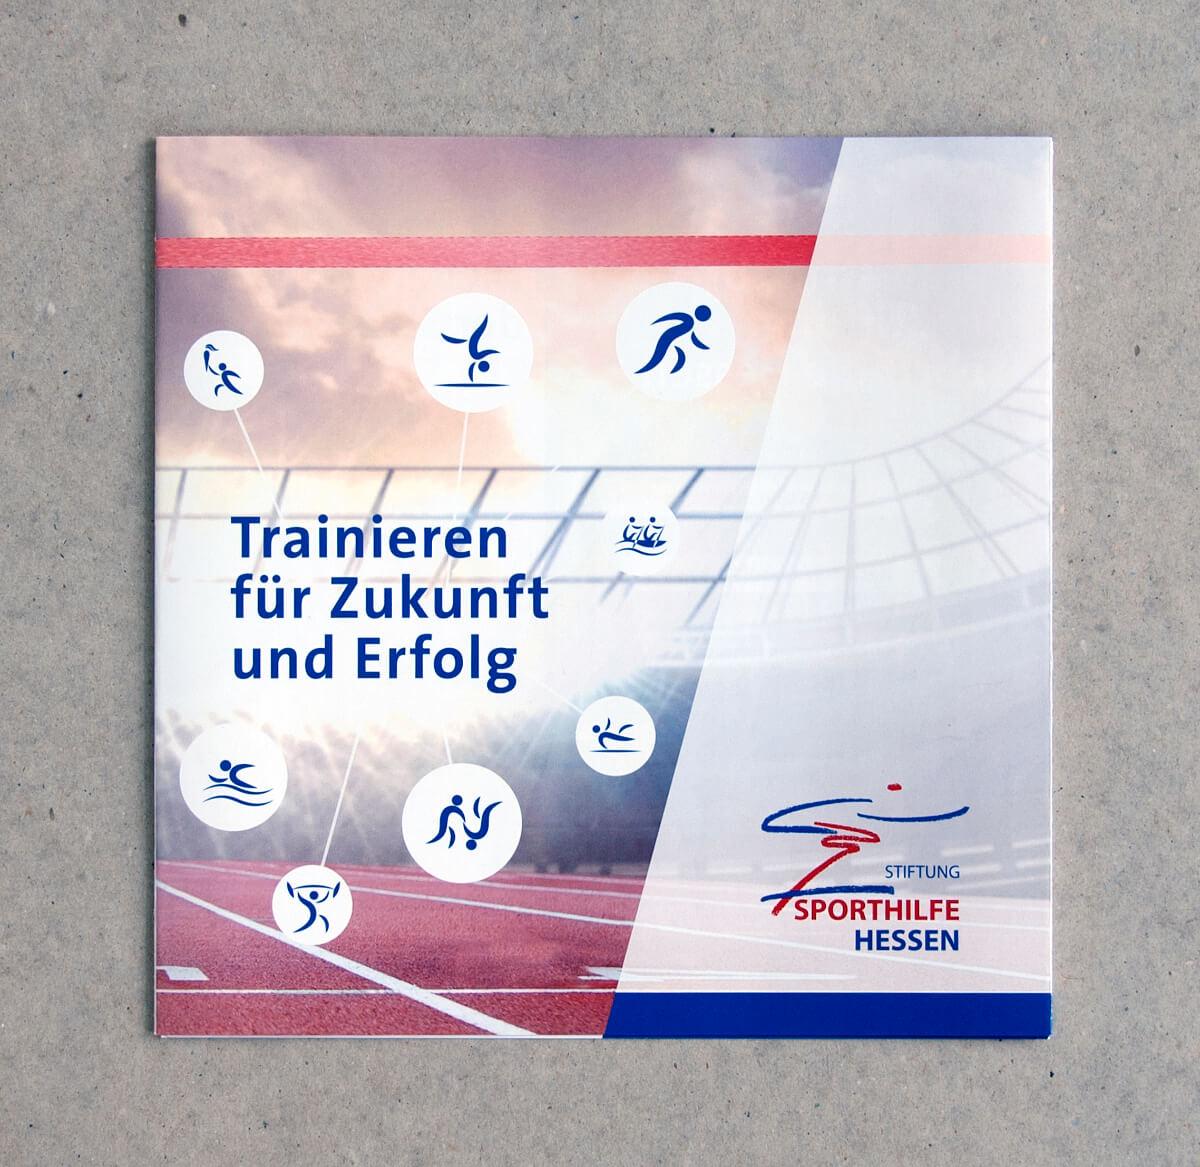 sporthilfe_hessen_1